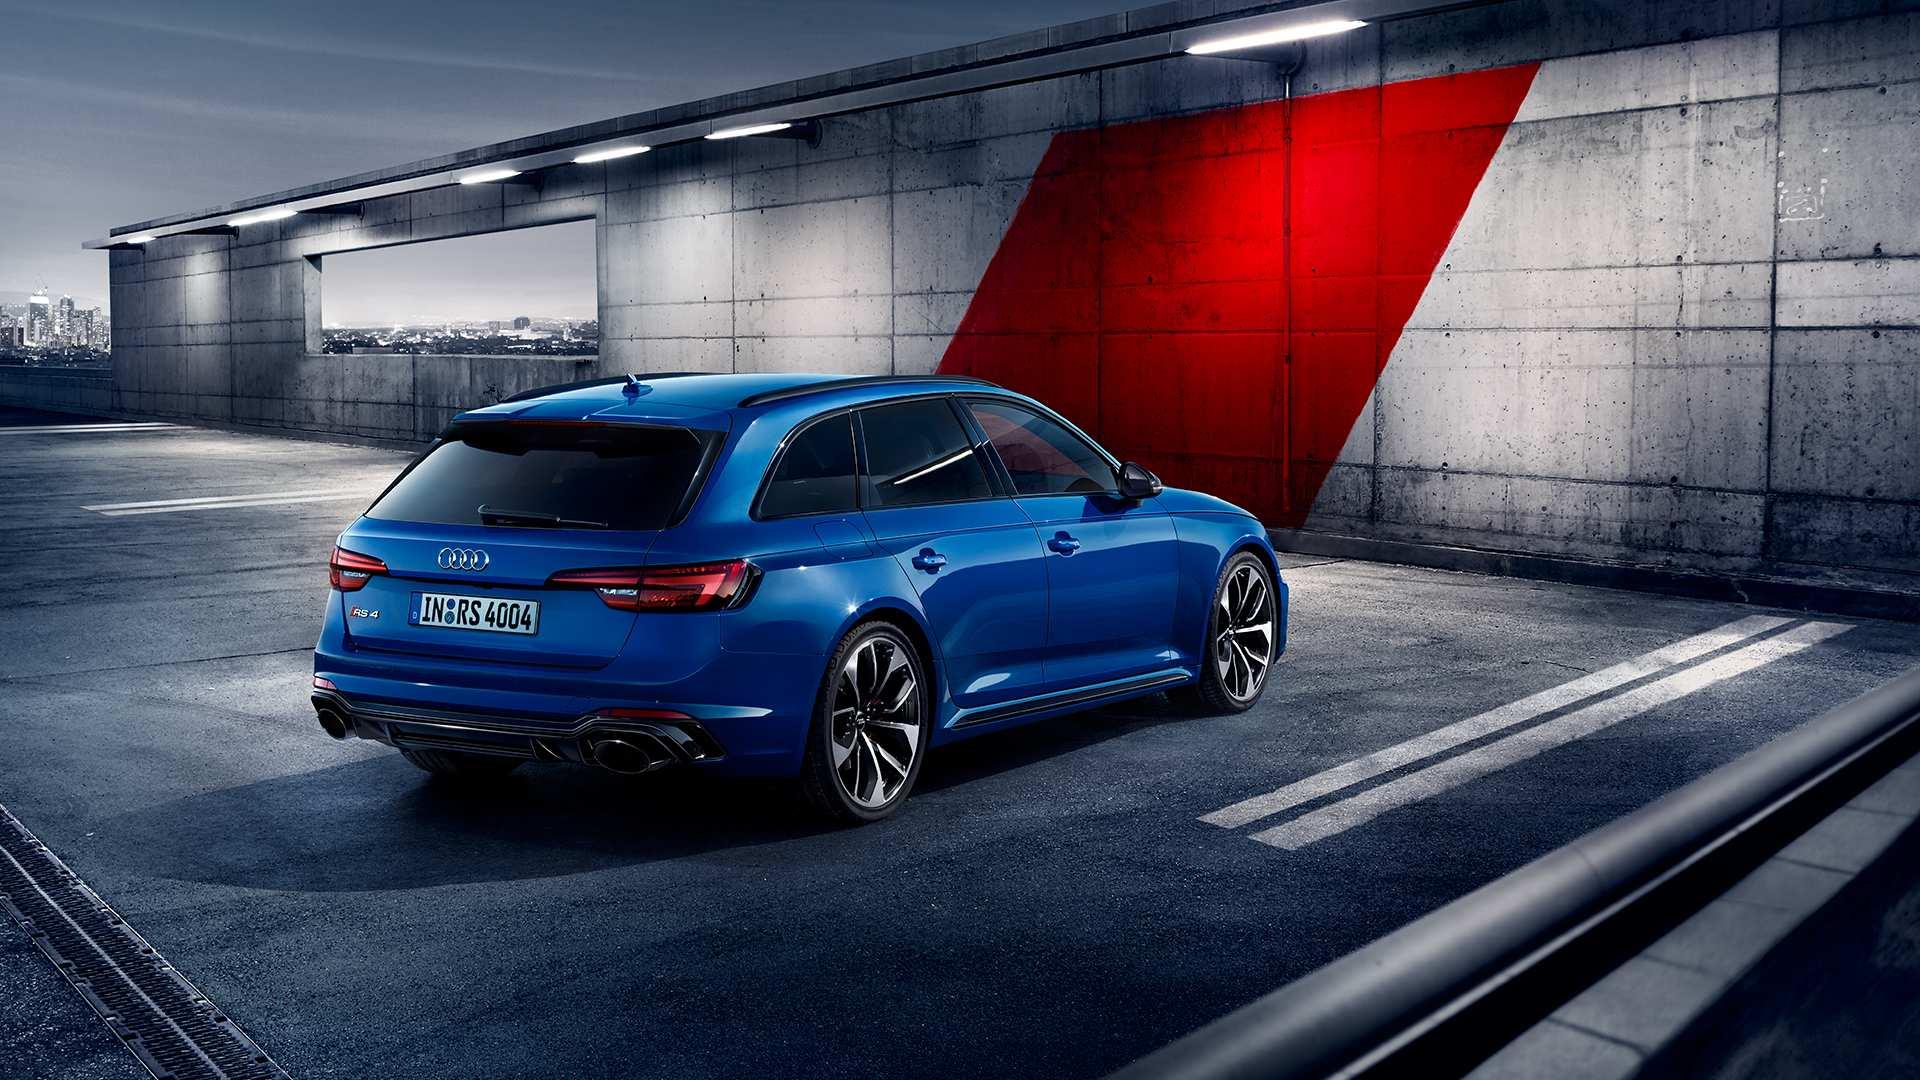 Audi RS4 Avant - Mercedes-AMG C 63 S Estate